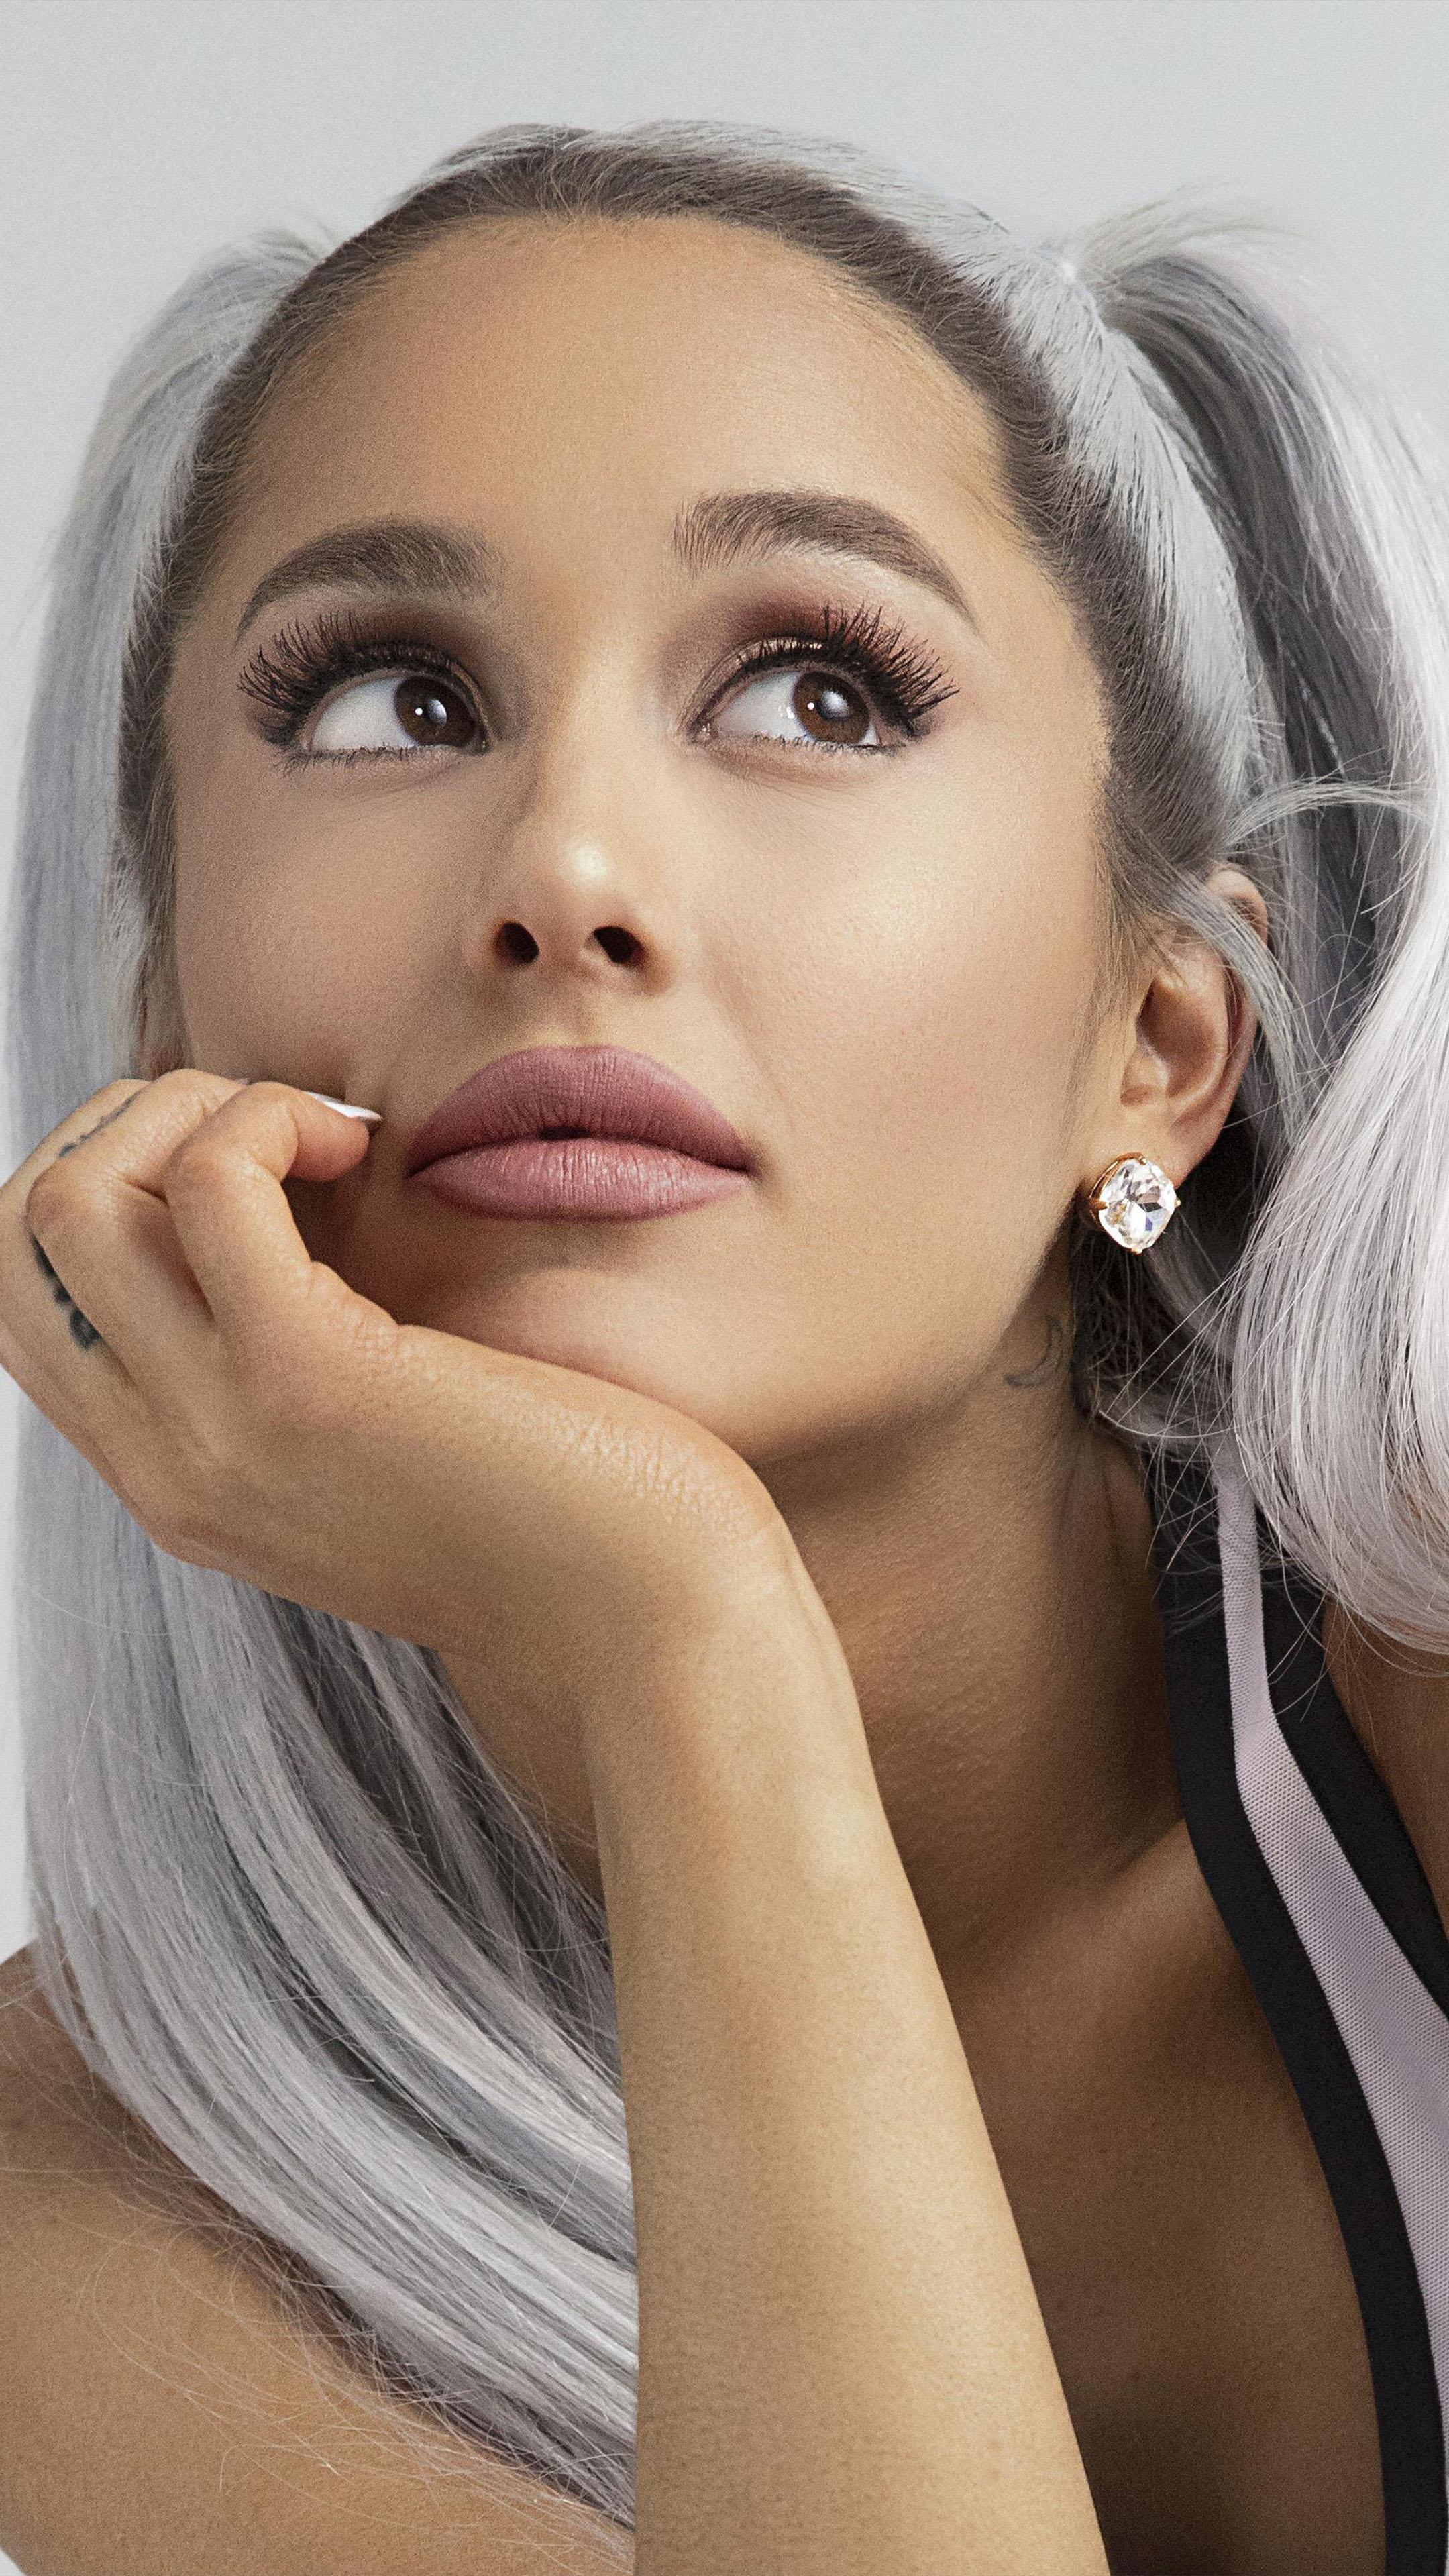 Ariana Grande Cute Photoshoot 2018 Free 4K Ultra HD Mobile ...